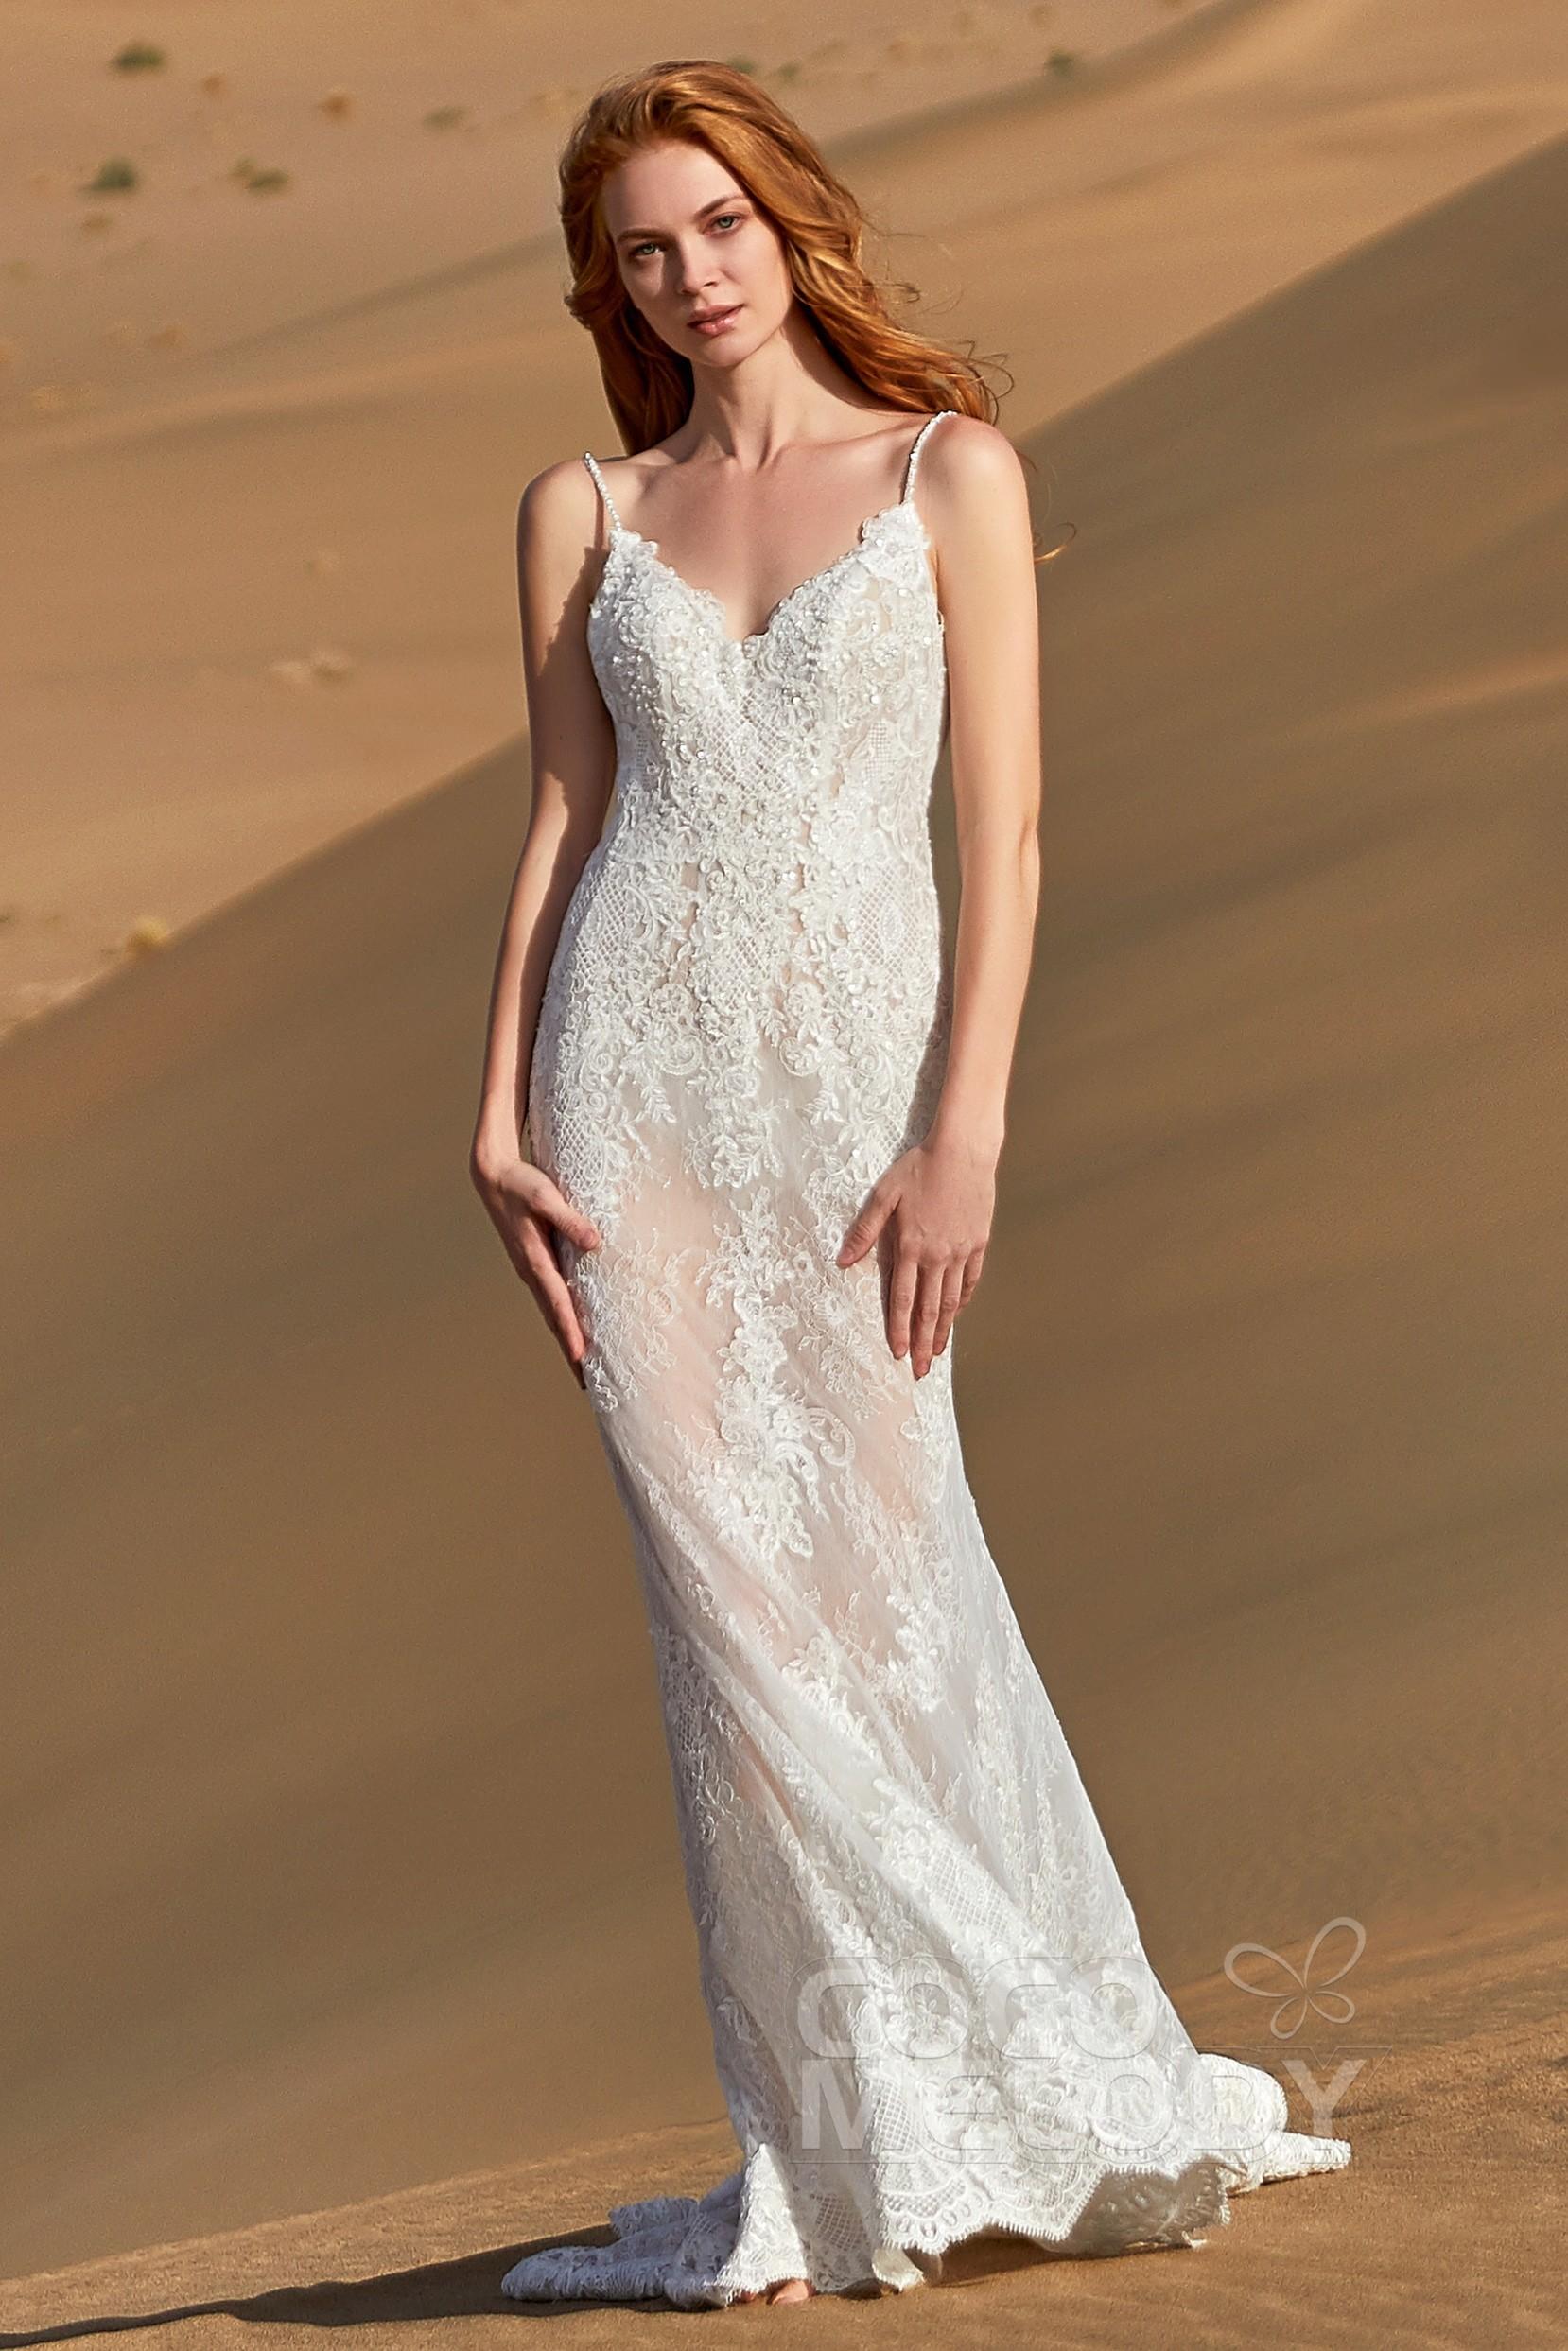 812dff5e23ce Romantic Spaghetti Strap Sleeveless Wedding Dress LD5807 | Cocomelody